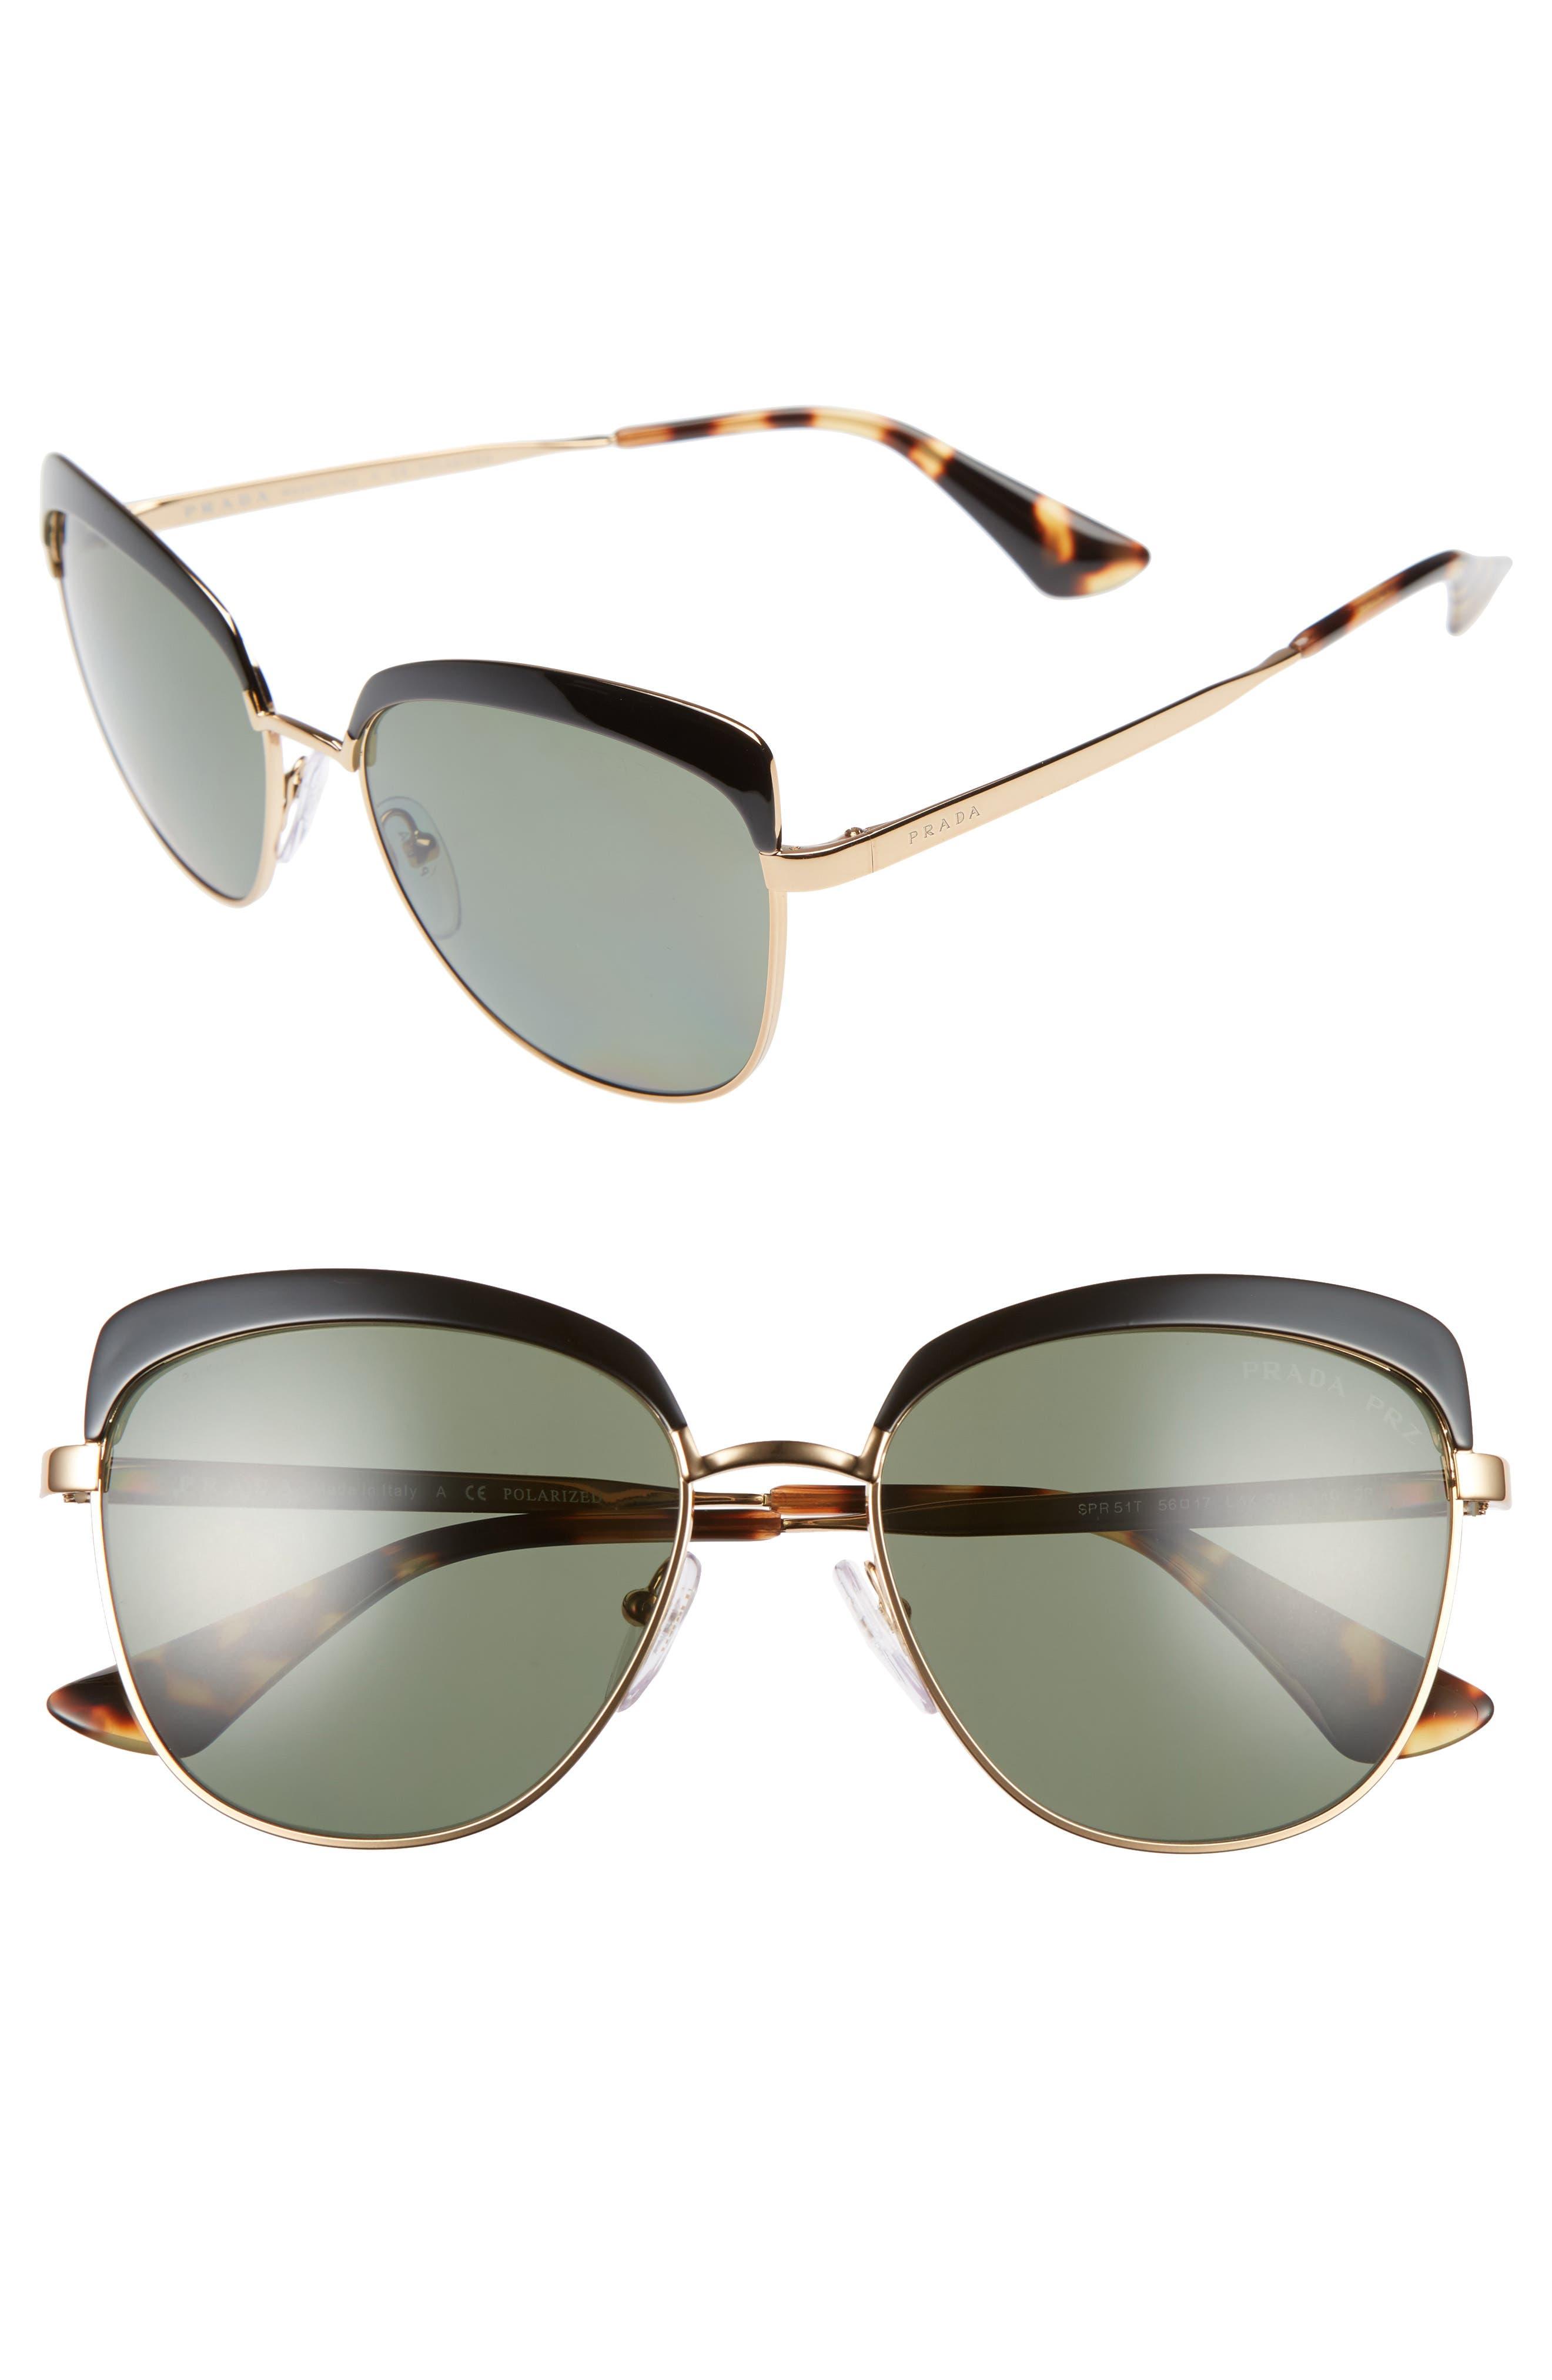 Prada 56mm Polarized Sunglasses